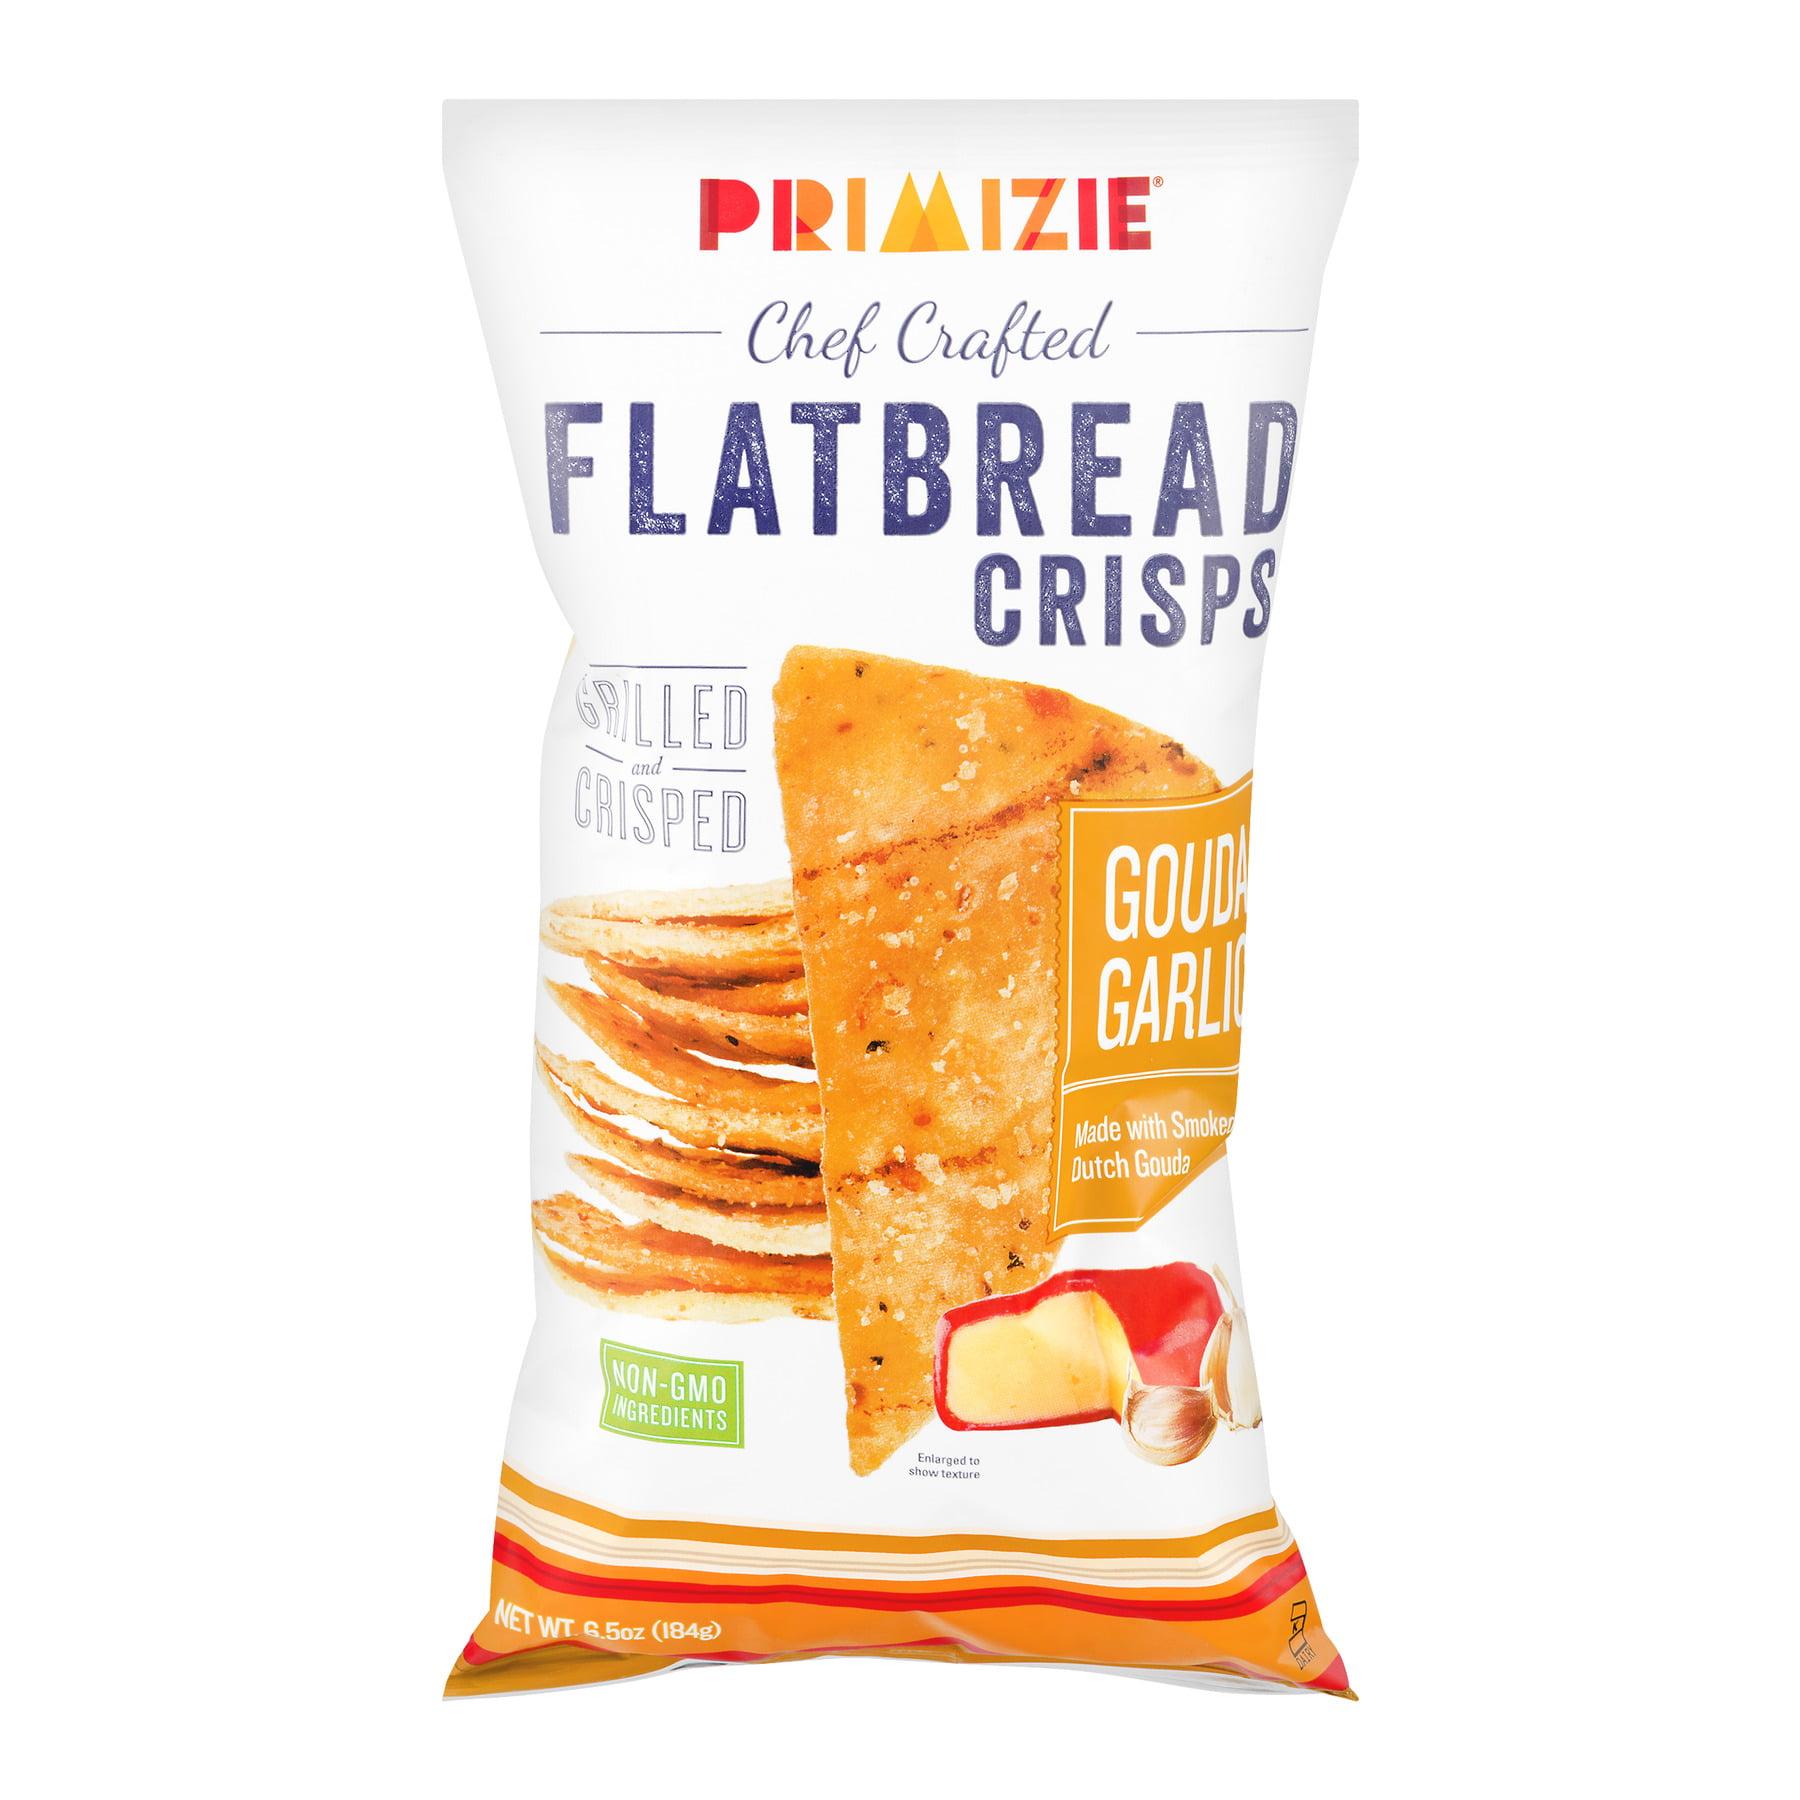 Primizie Chef Crafted Flatbread Crisps Gouda Garlic, 6.5 OZ by Piadina, Inc.